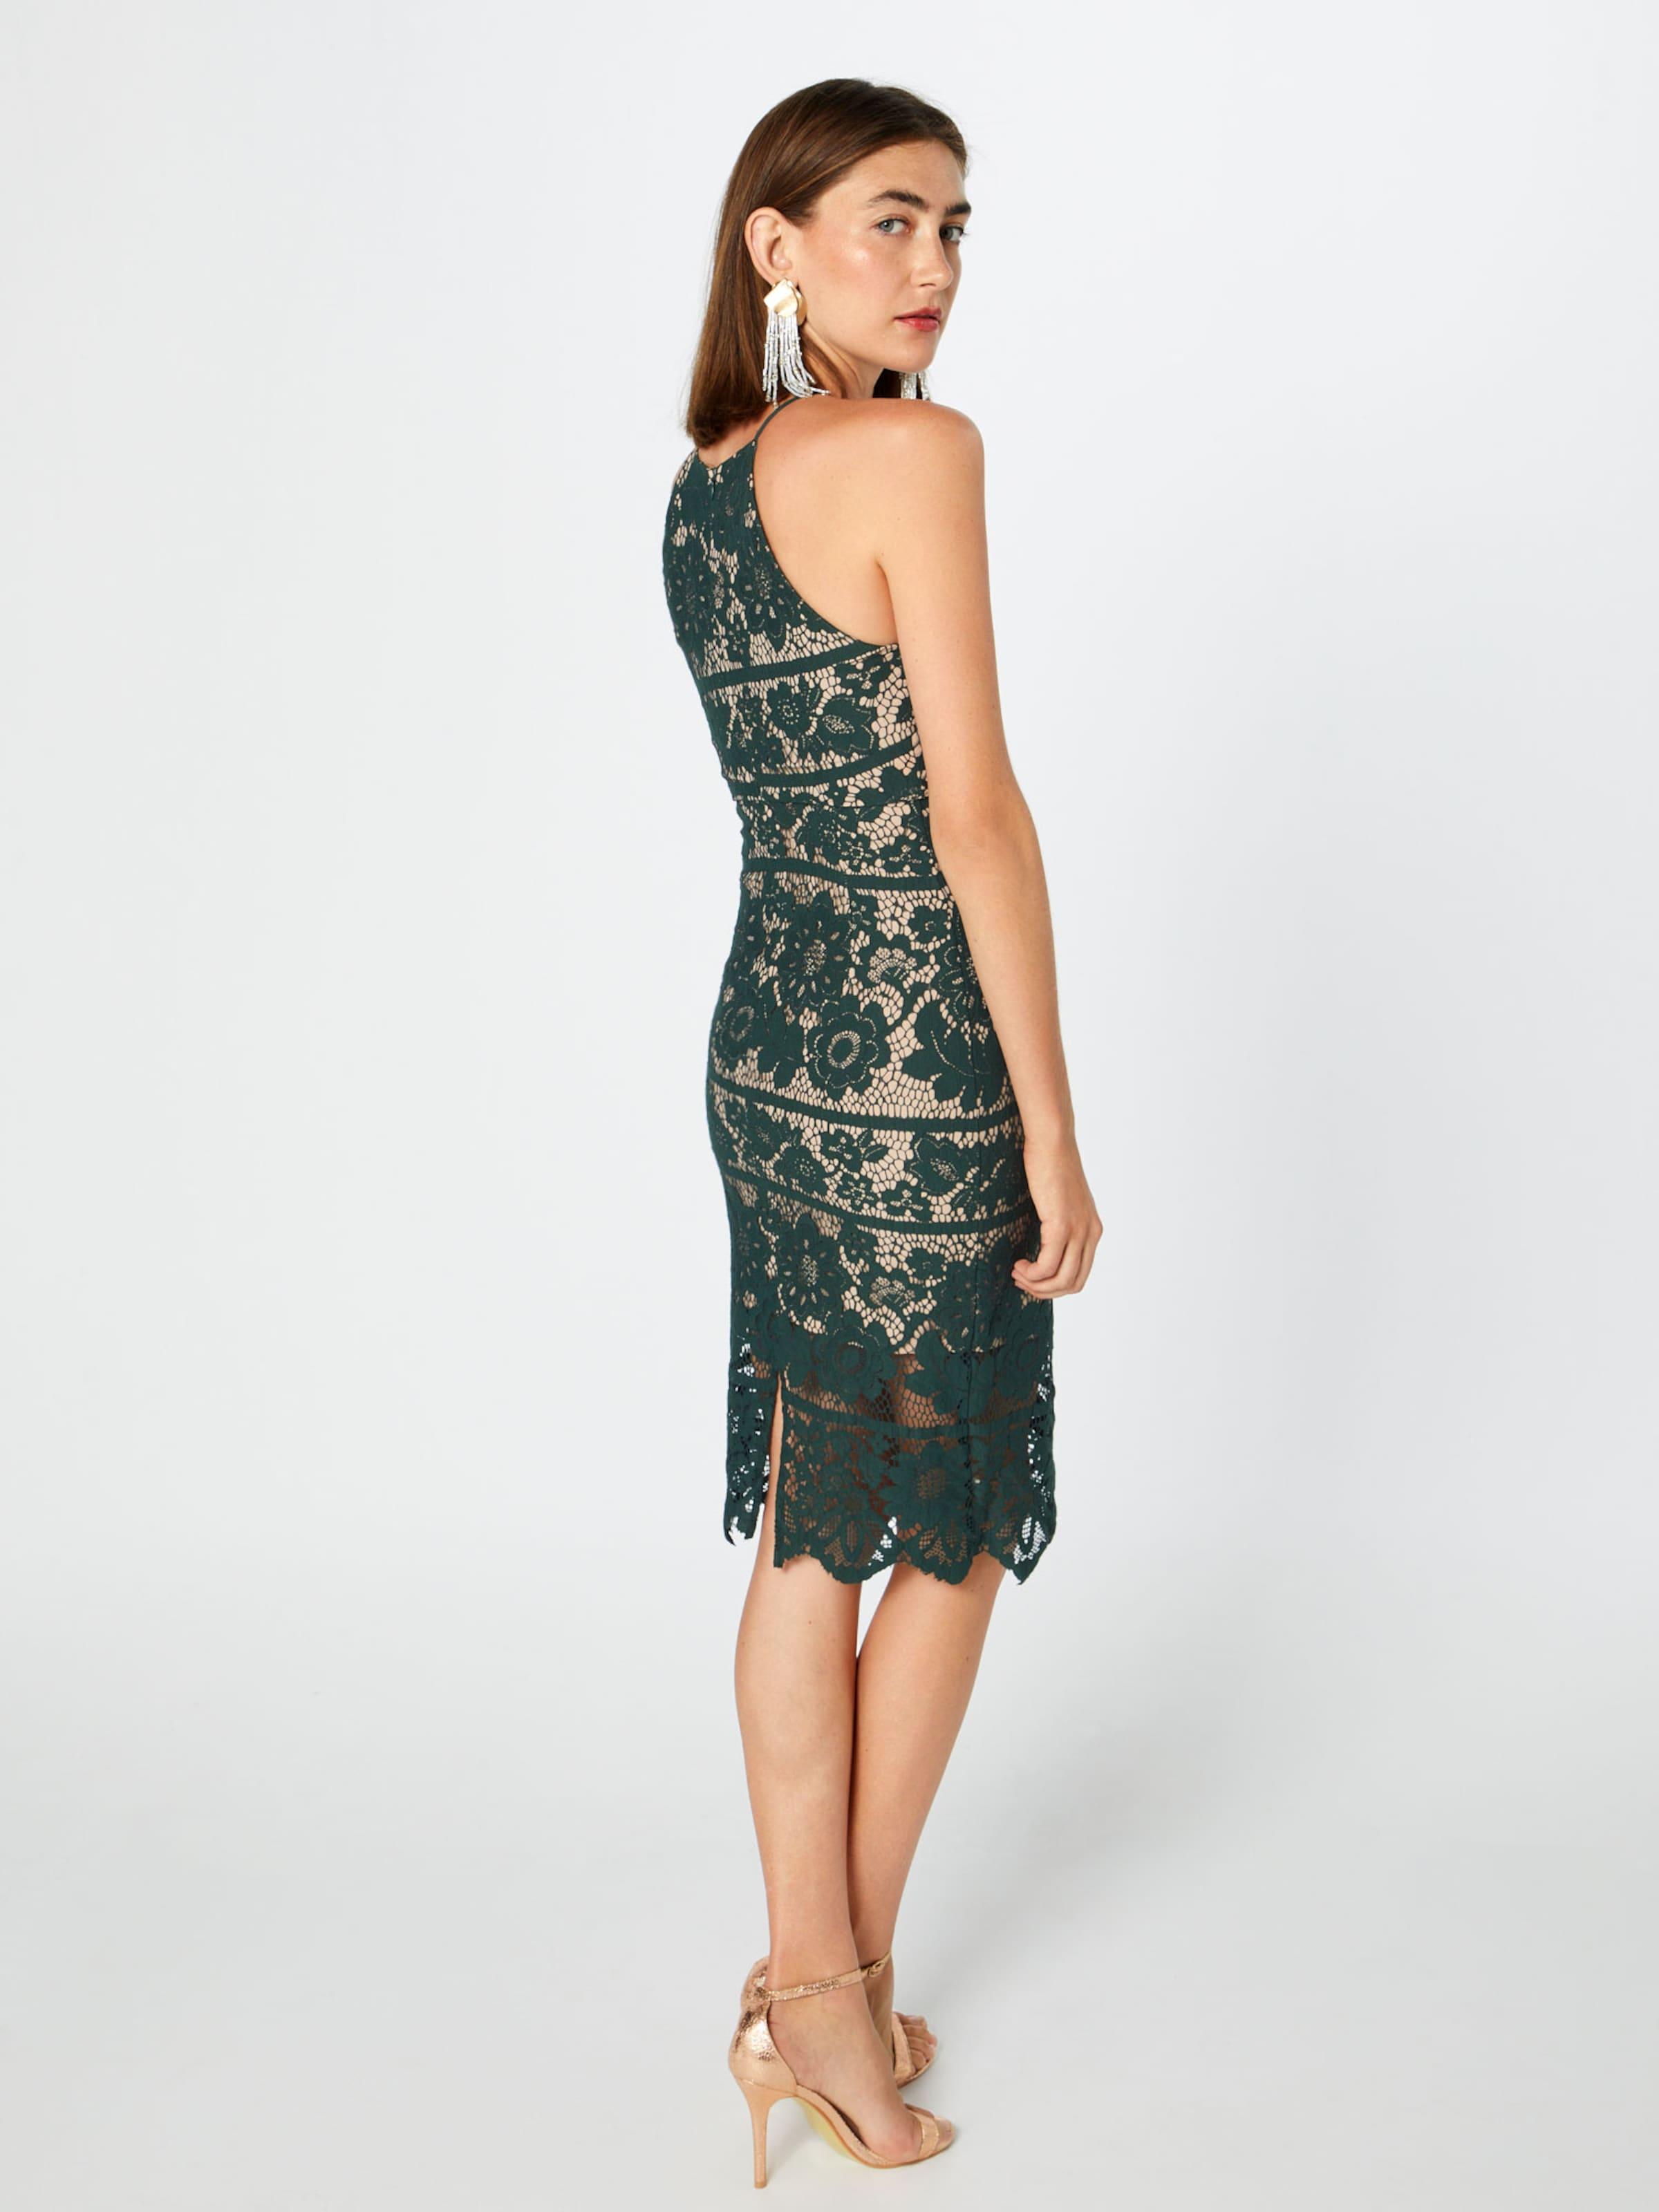 Grün Bardot Bardot Spitzenkleid 'mila' In Spitzenkleid 'mila' In v0Nmw8nO